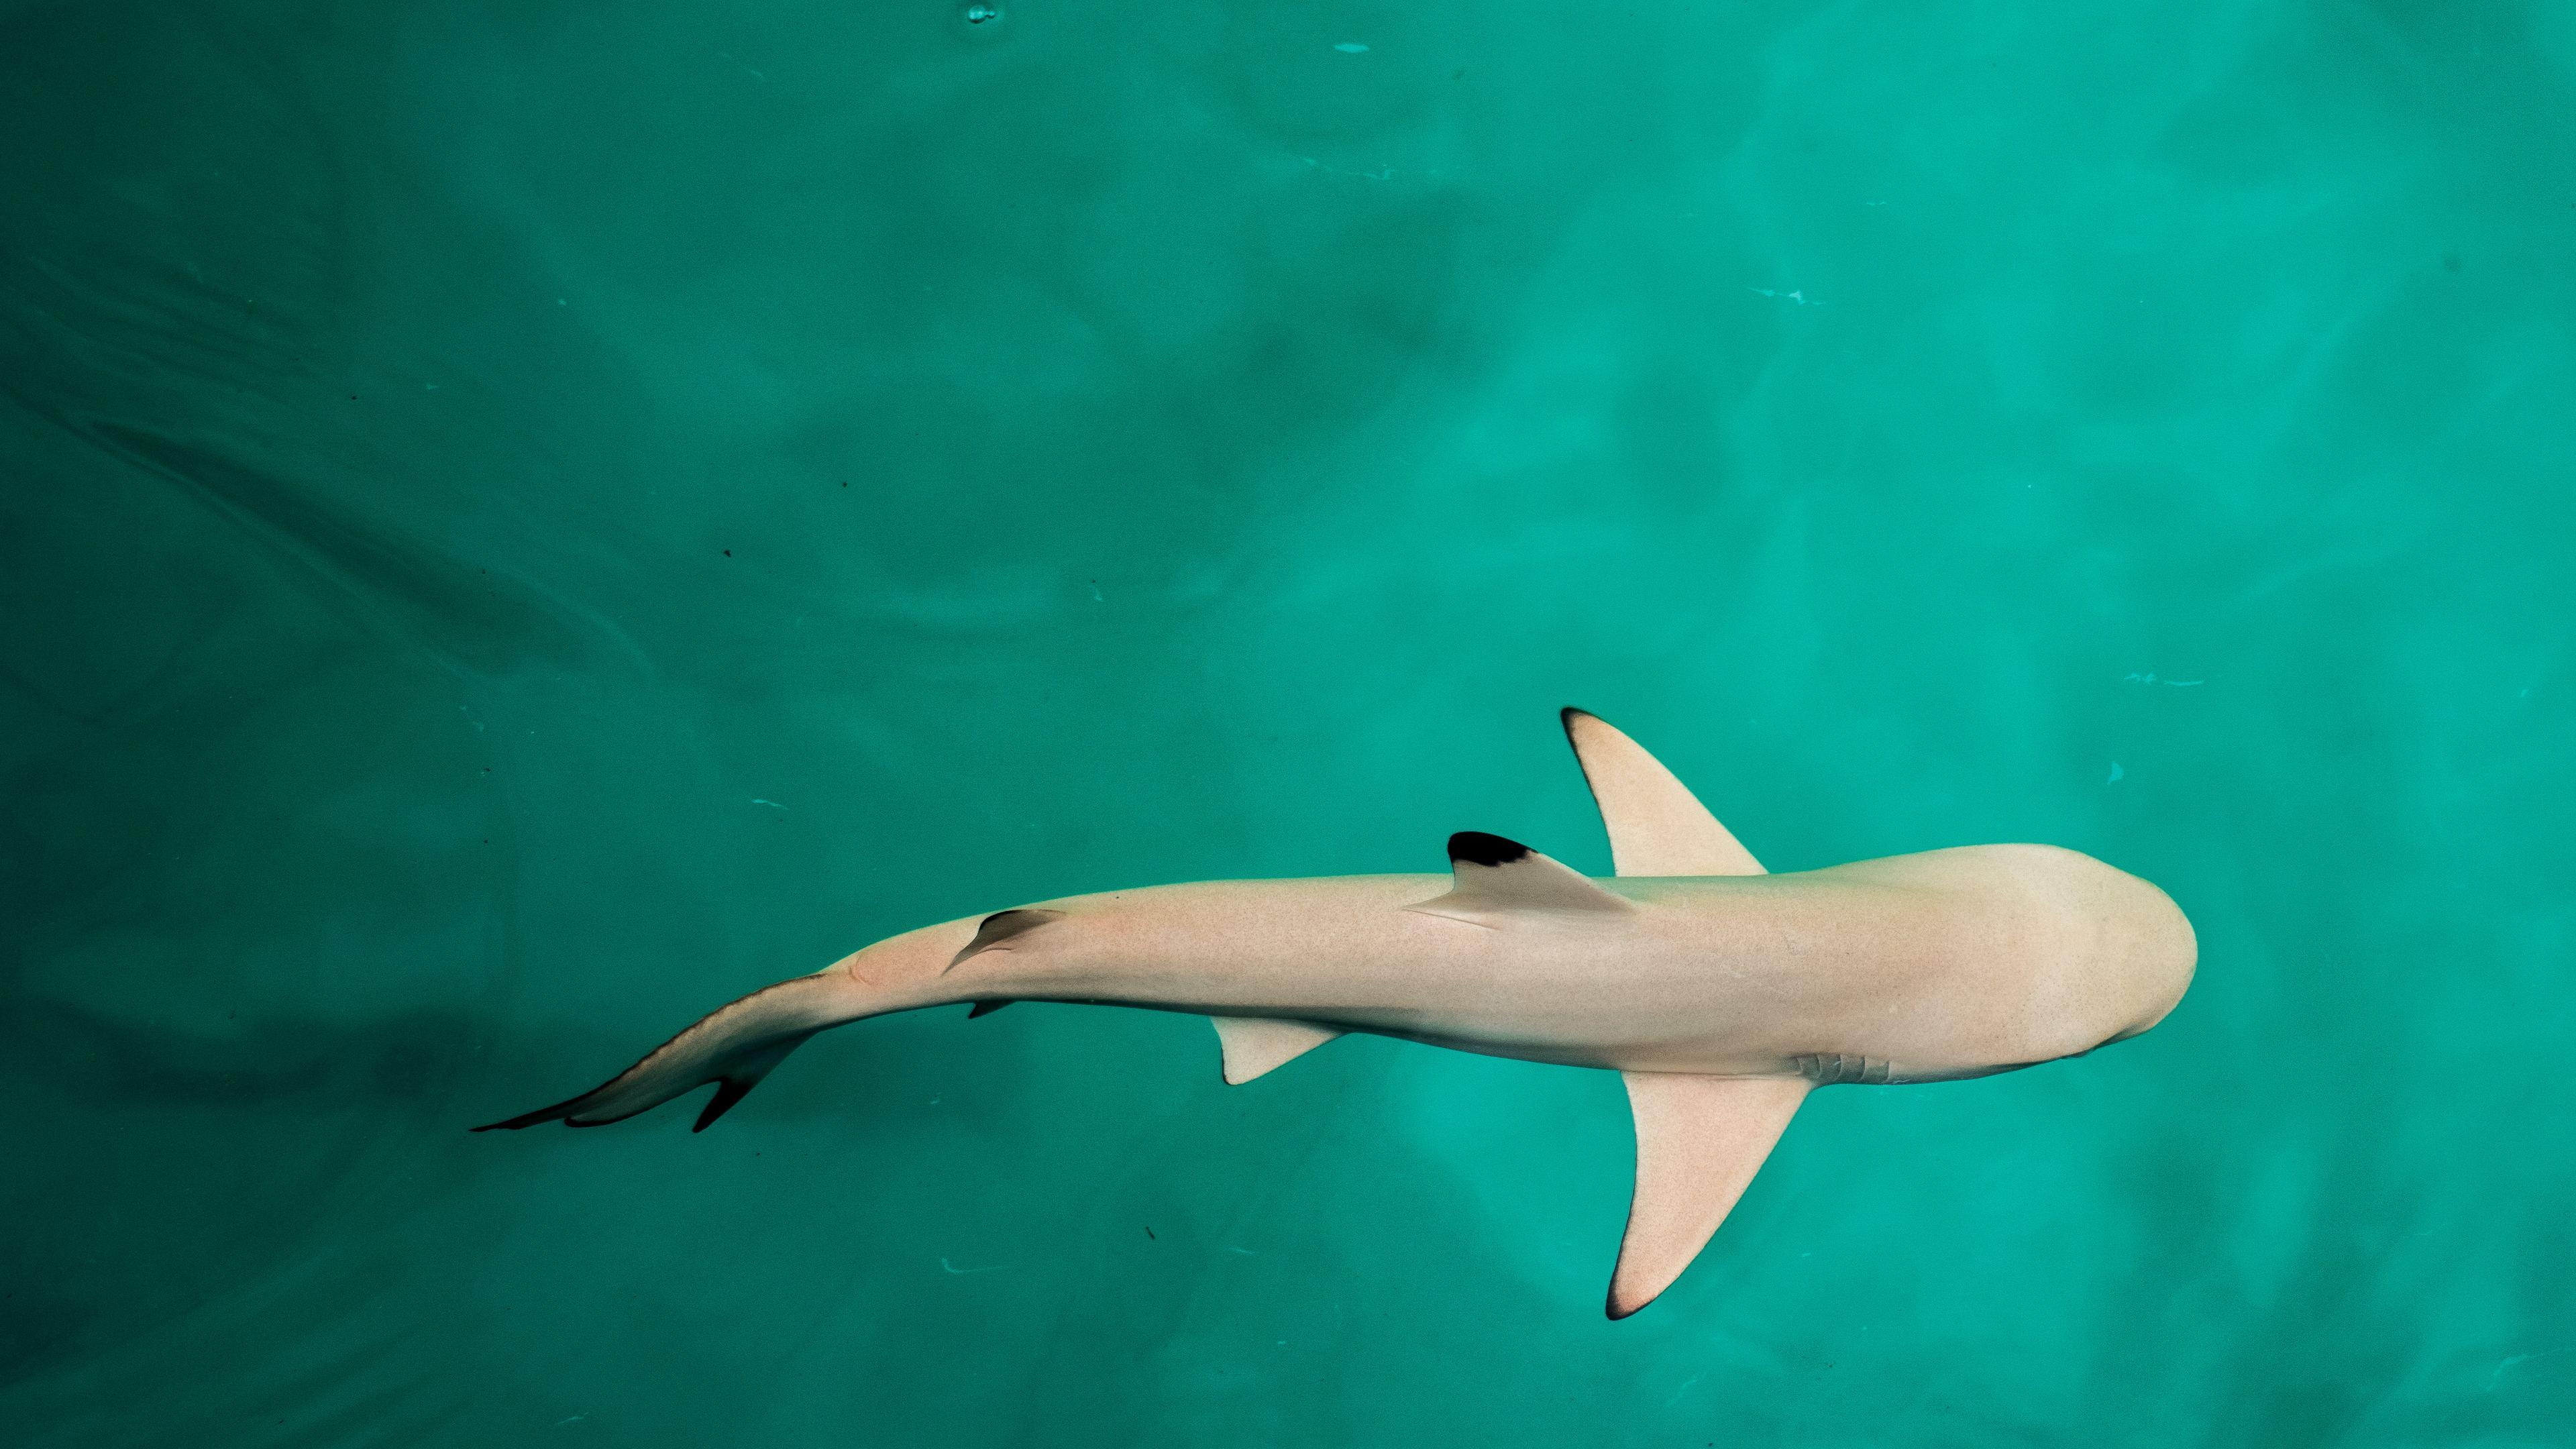 baby shark 4k 1542239080 - Baby Shark 4k - underwater wallpapers, shark wallpapers, hd-wallpapers, fish wallpapers, animals wallpapers, 4k-wallpapers